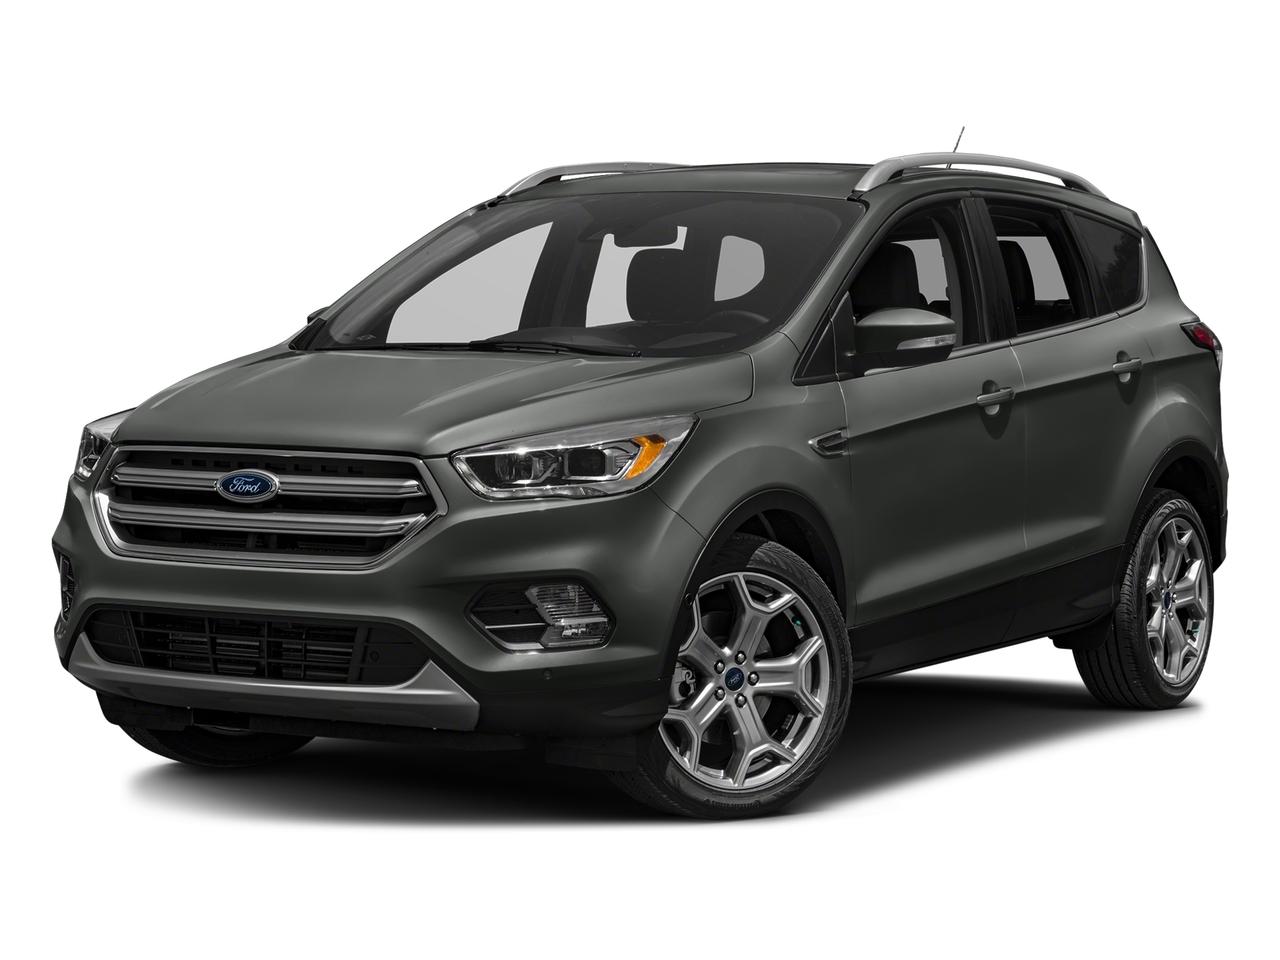 Magnetic 2017 Ford Escape TITANIUM SUV Winston-Salem NC